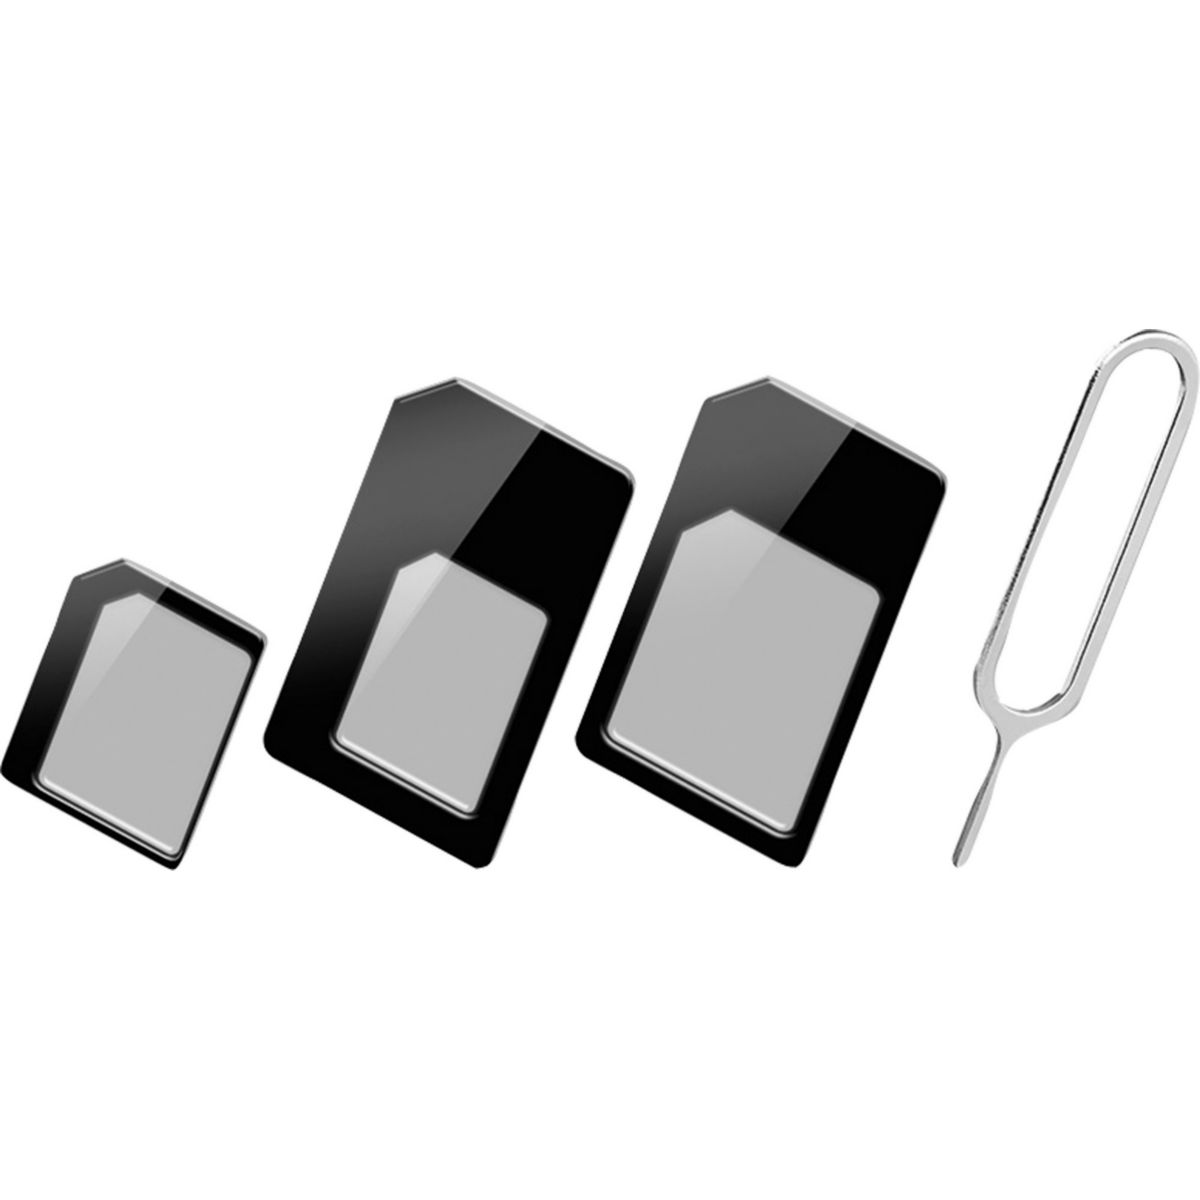 goobay SIM-Kartenadapter (3in1) mit PIN jetztbilligerkaufen